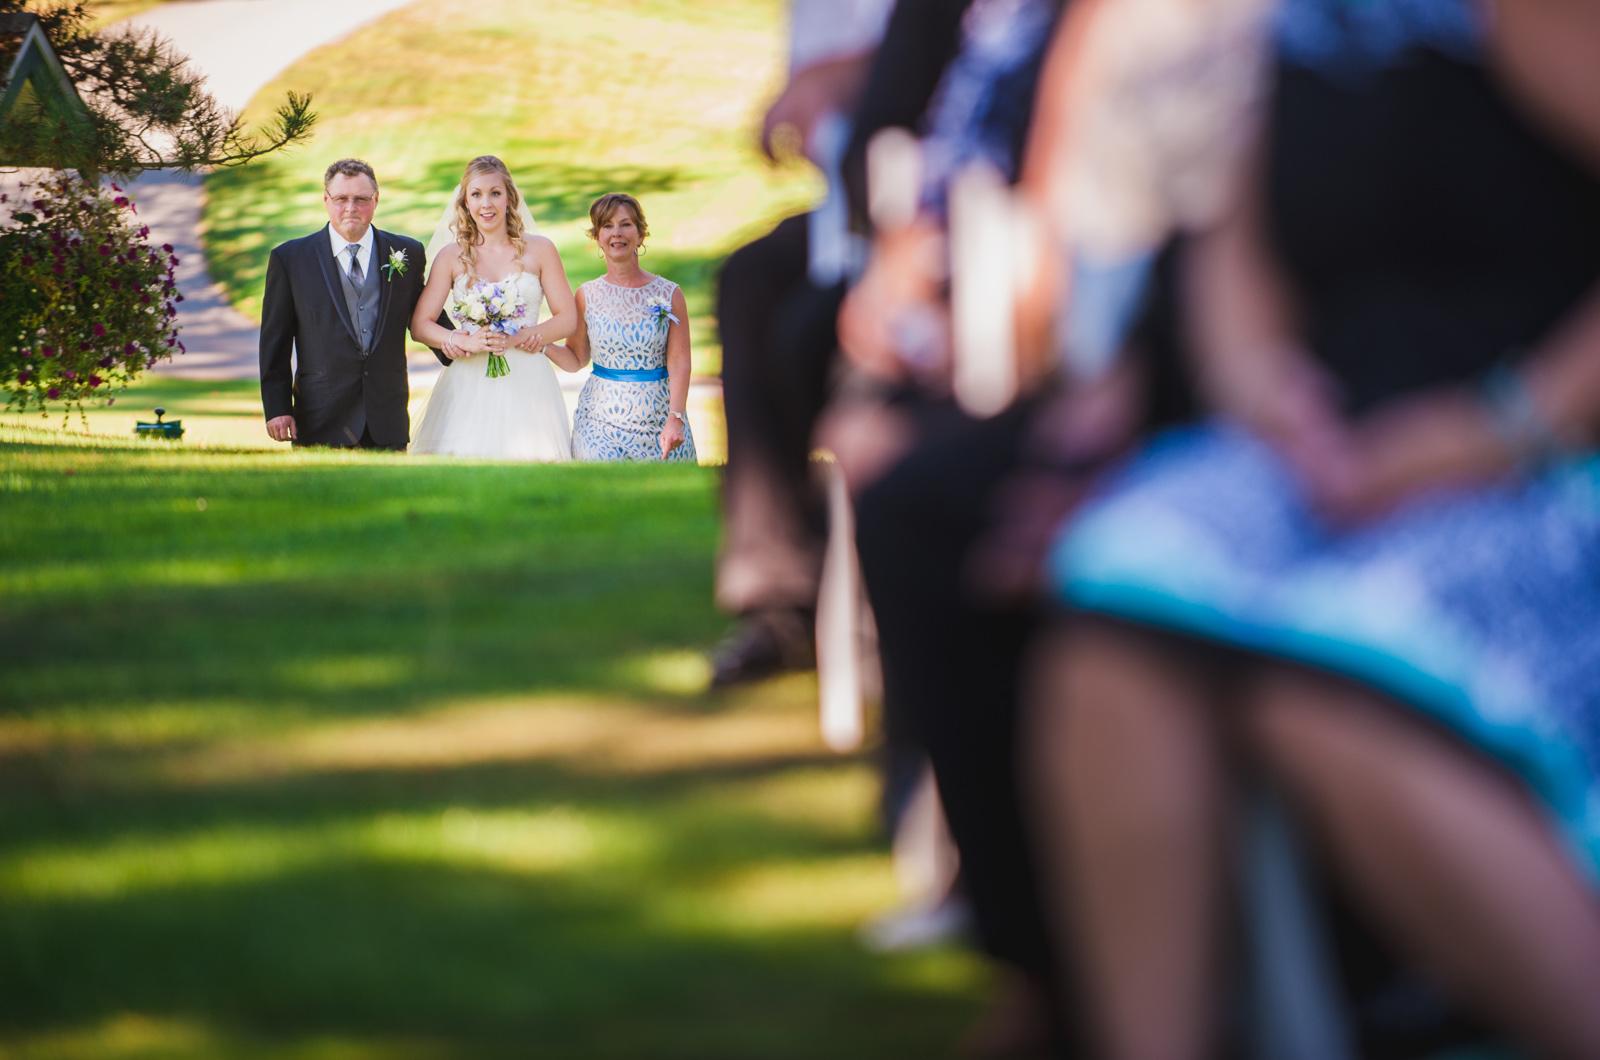 victoria-wedding-photographers-royal-colwood-golf-course-wedding-14.jpg